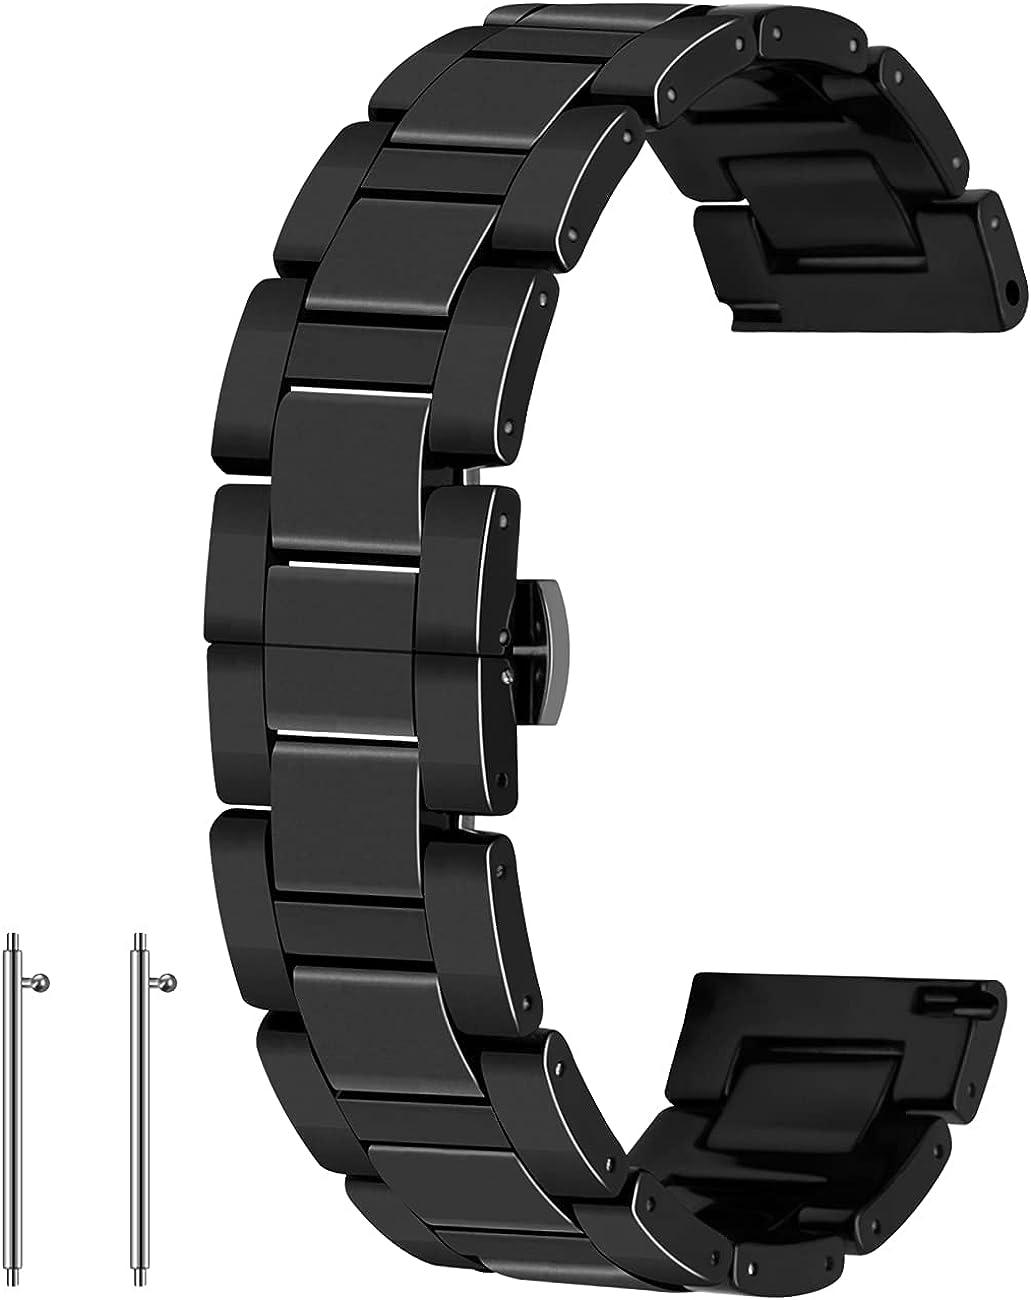 Kai Tian Ceramic Watch Band Release Quick 20mm Strap Cheap bargain Columbus Mall 22mm